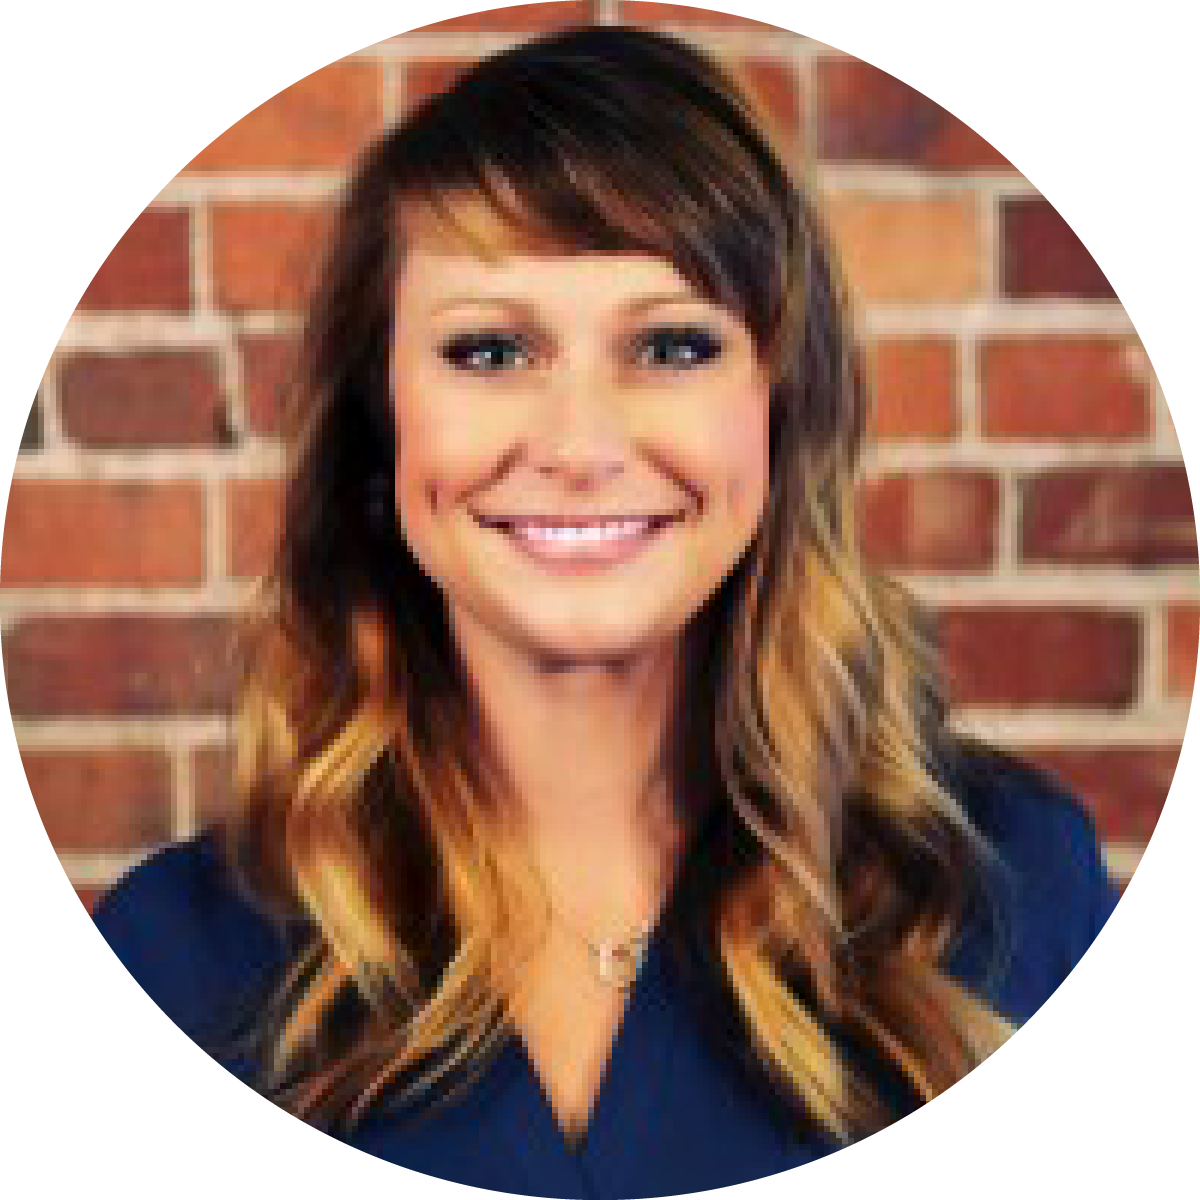 Colleen McGarity, Speaker at Women Impact Tech